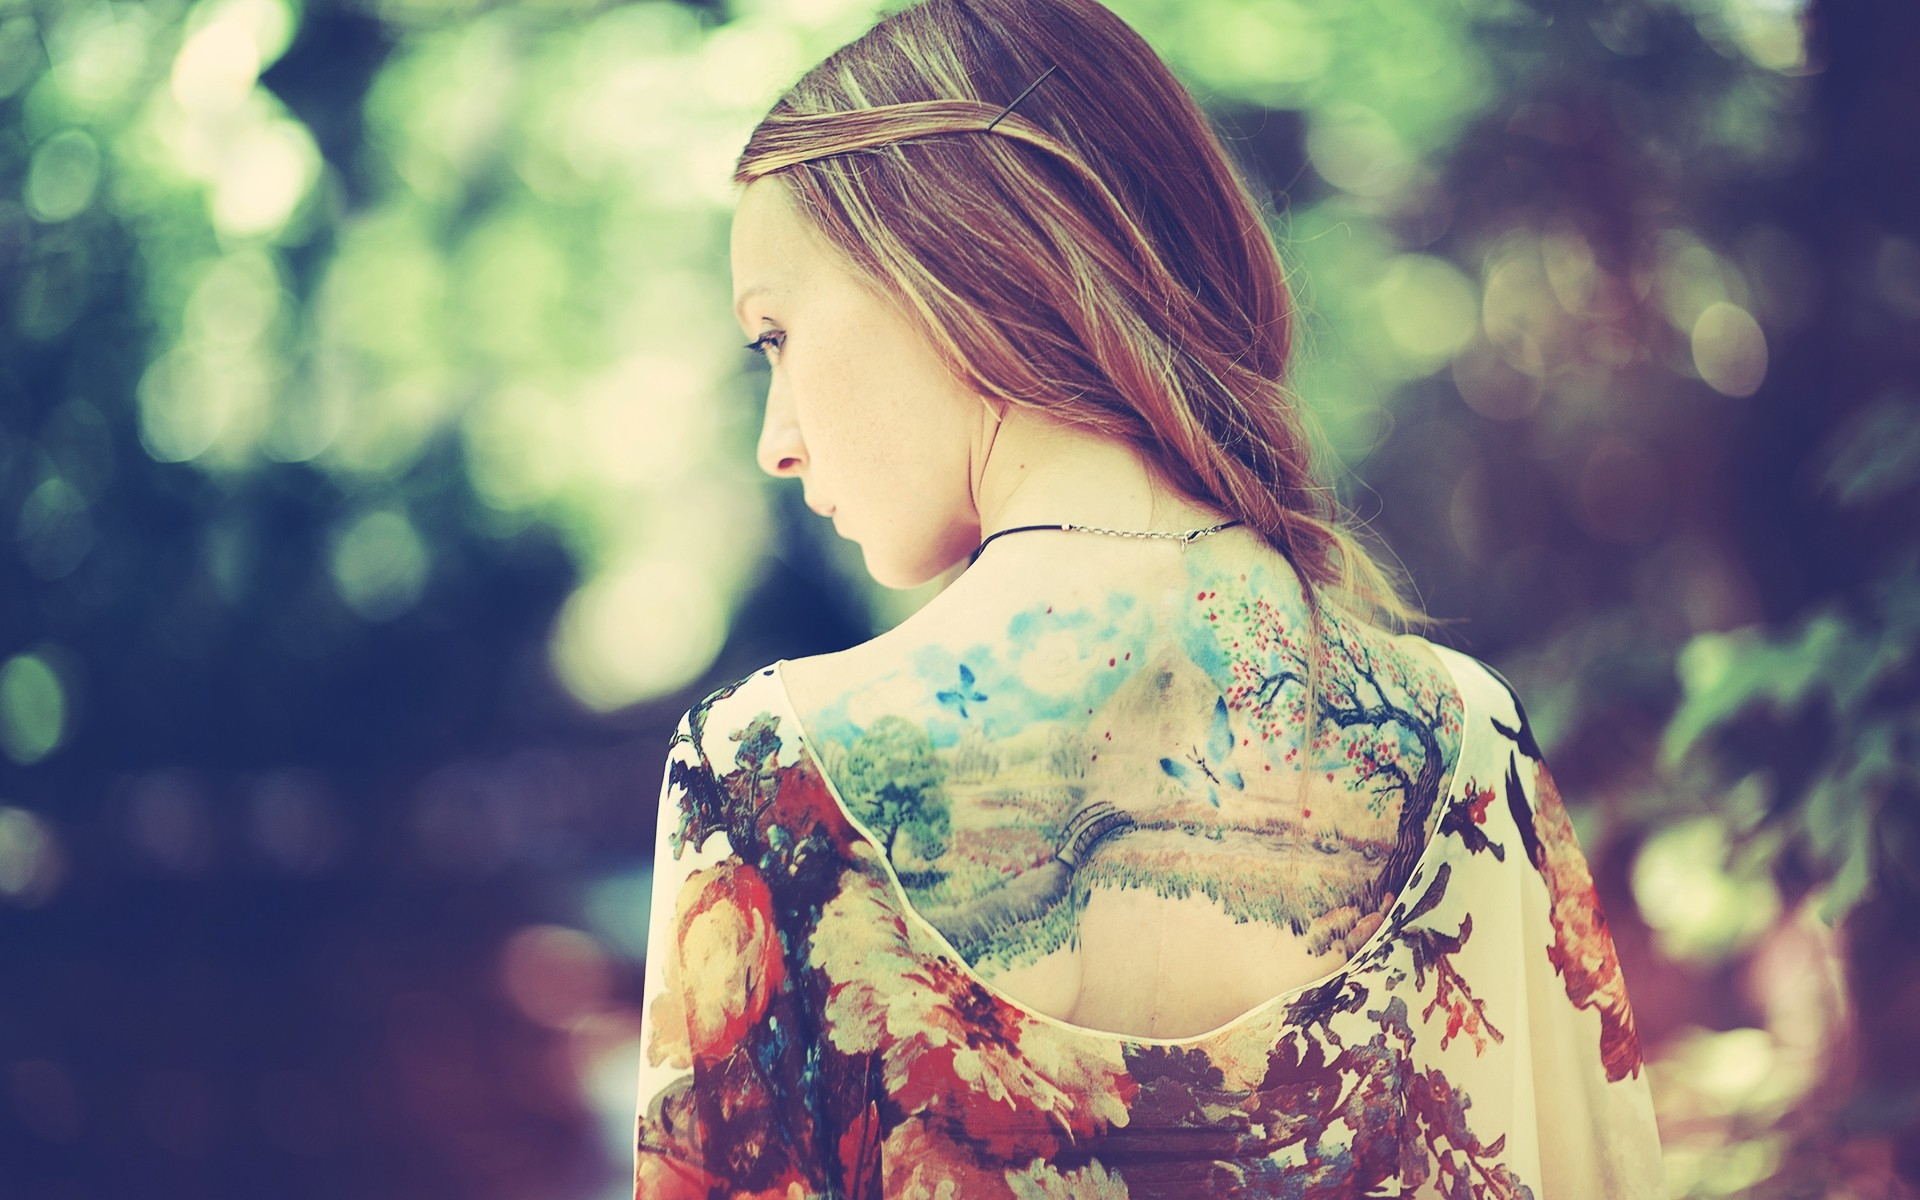 Fondos De Pantalla Niña Espalda Vestir Tatuajes Naturaleza